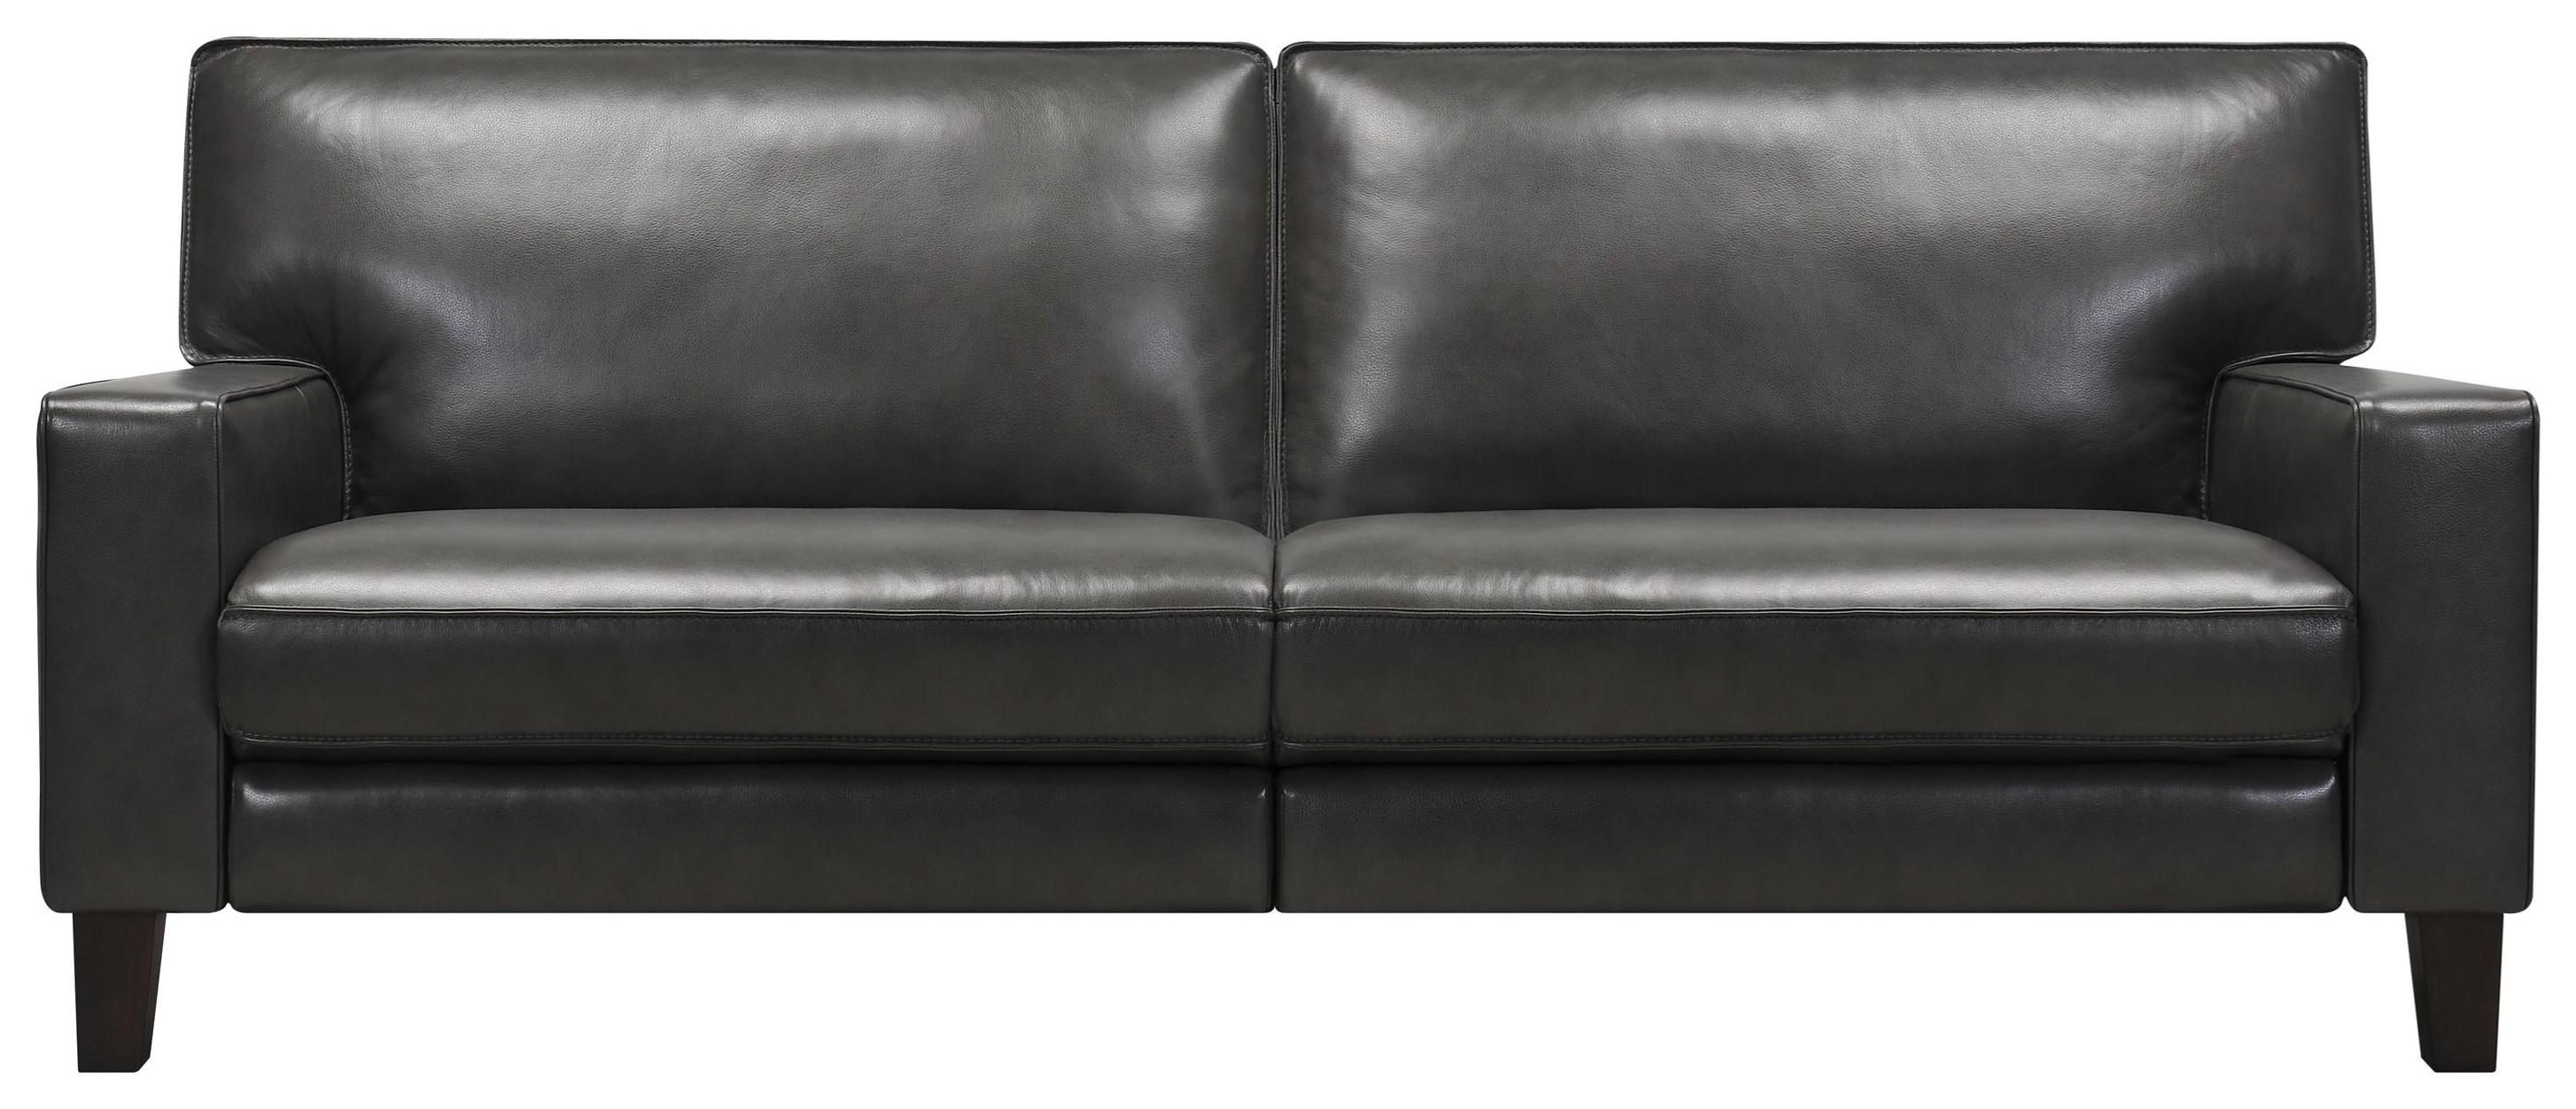 32644 Reclining Sofa by Violino at Stoney Creek Furniture